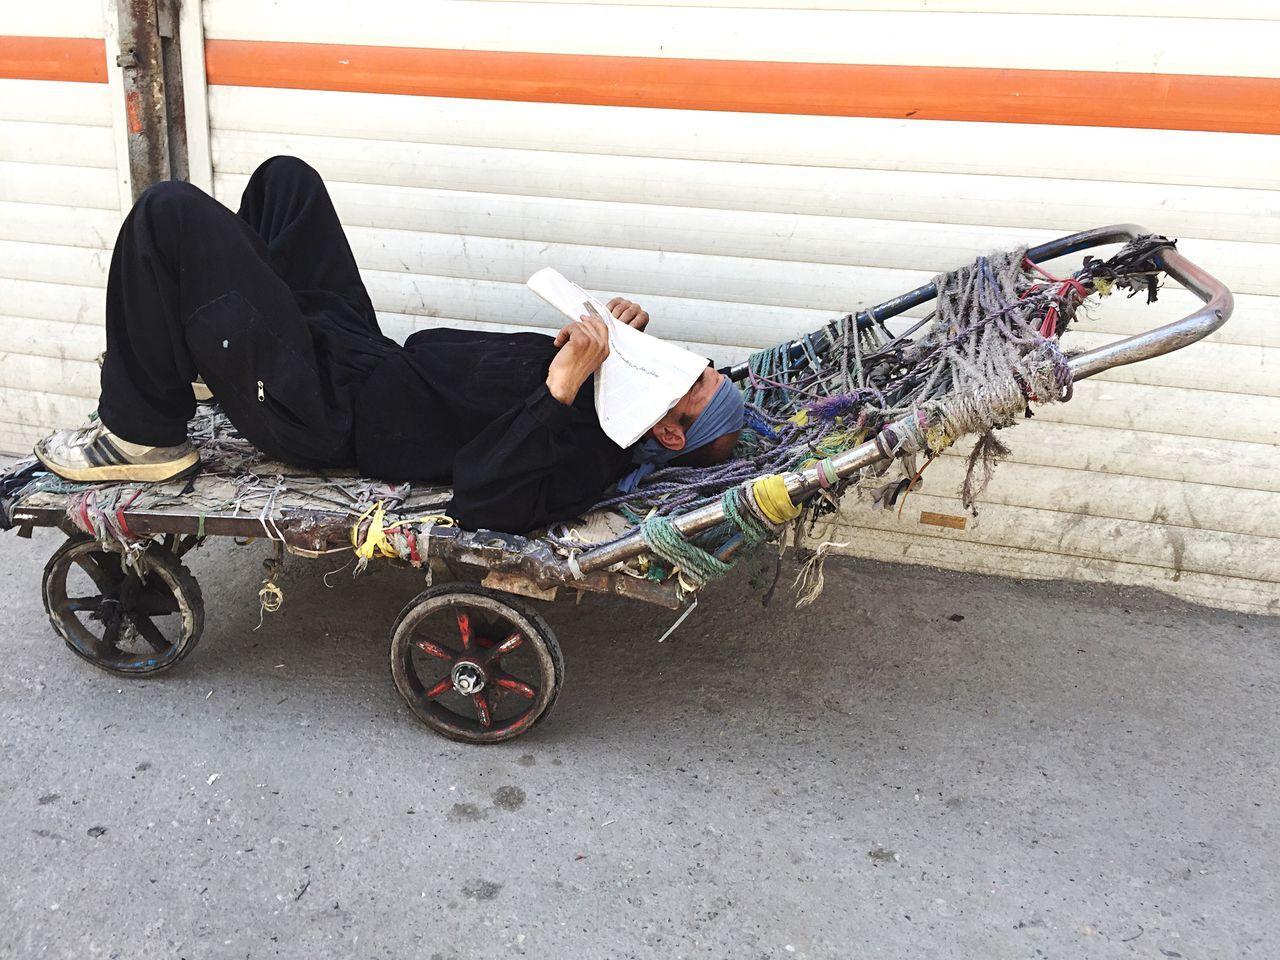 Man Sleeping On Cart Against Shutter At Molavi Square